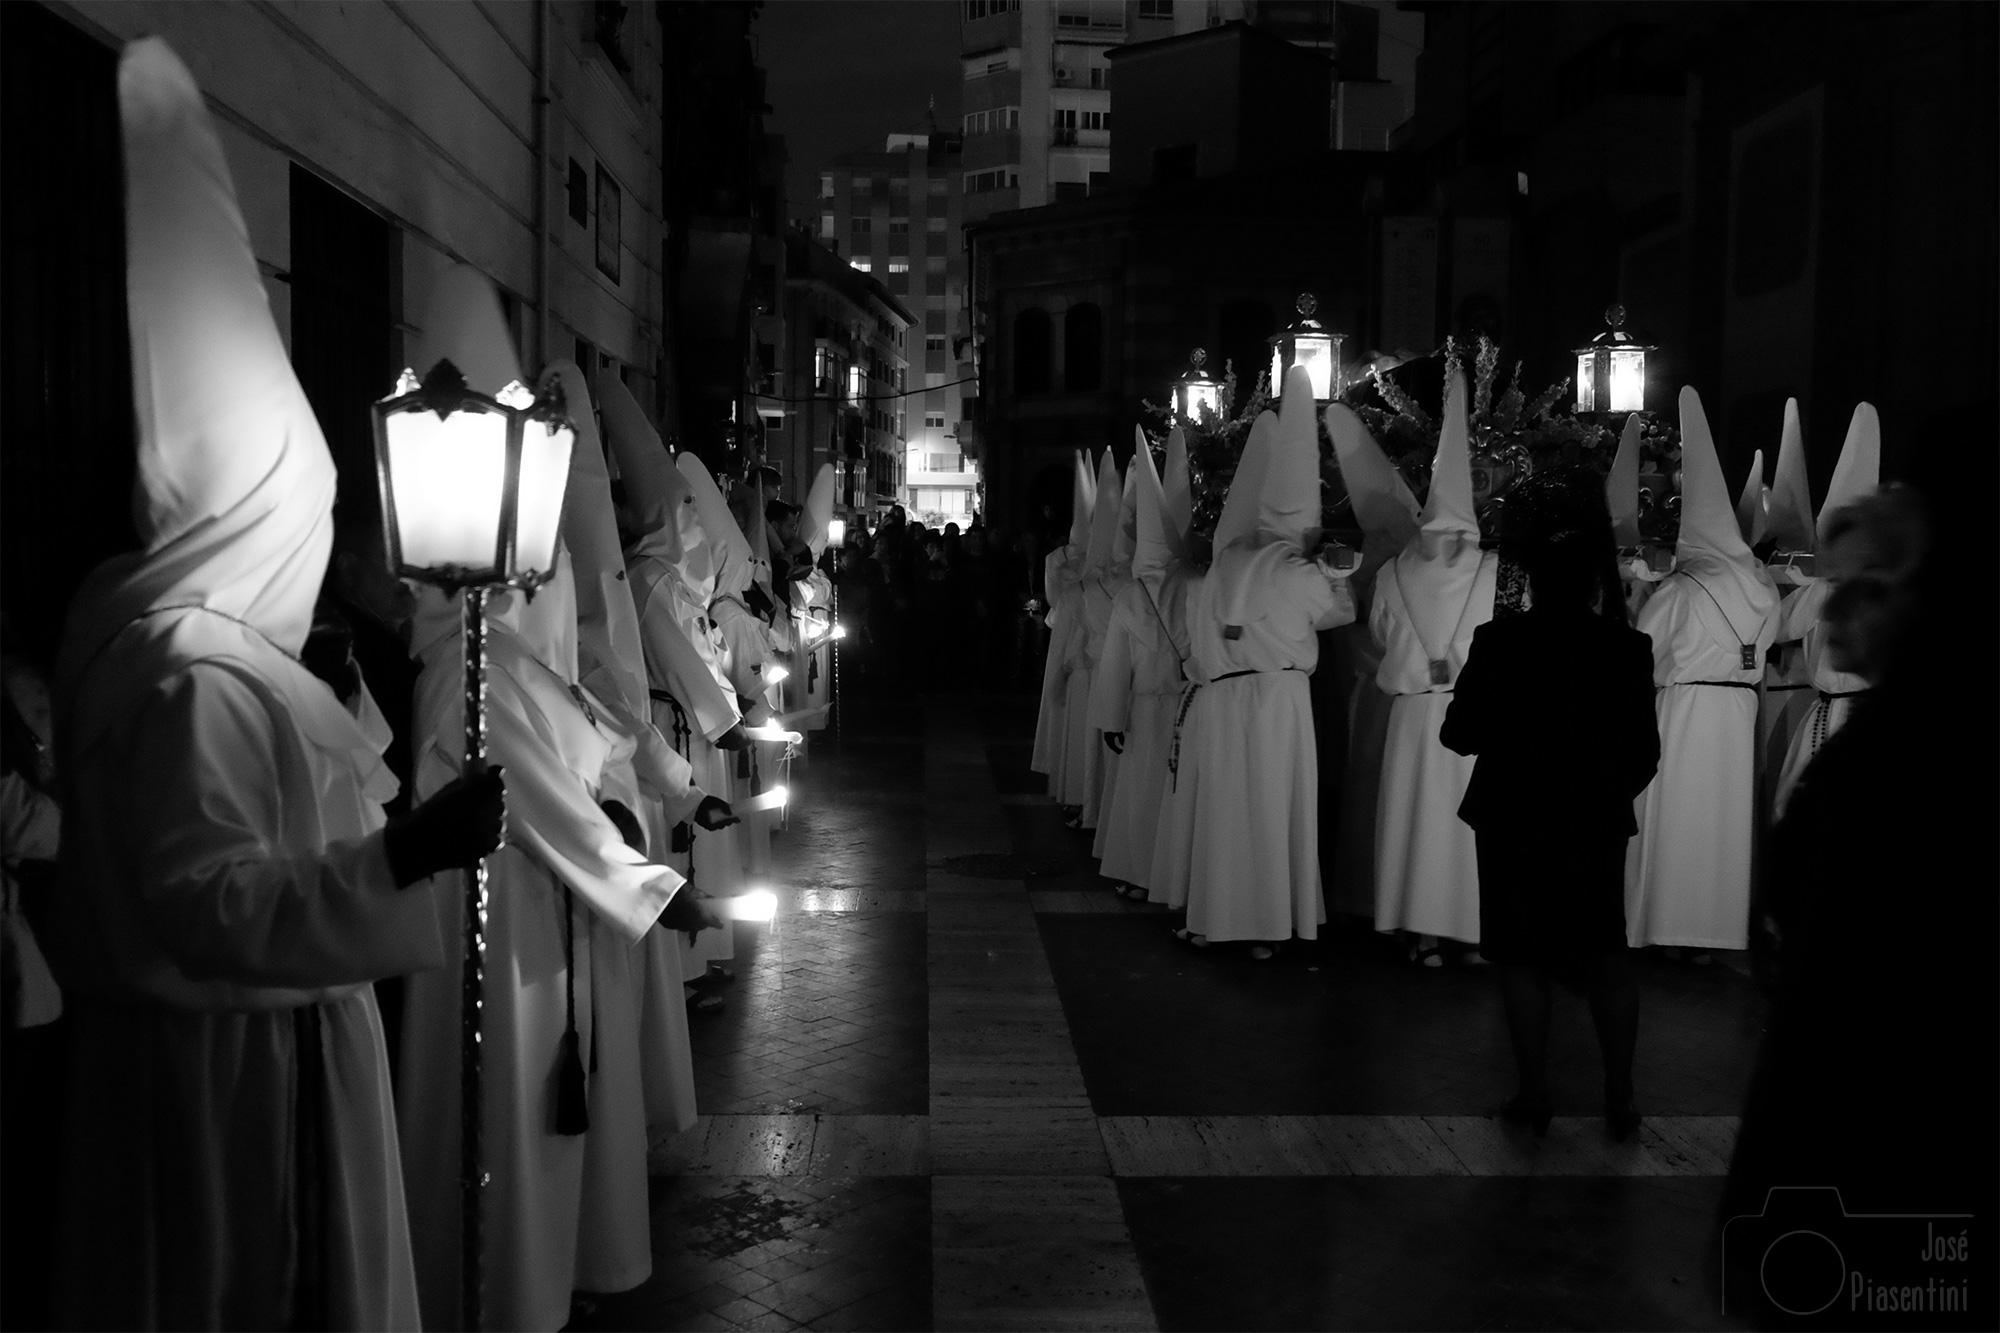 Capirotes de los Nazarenos de Murcia